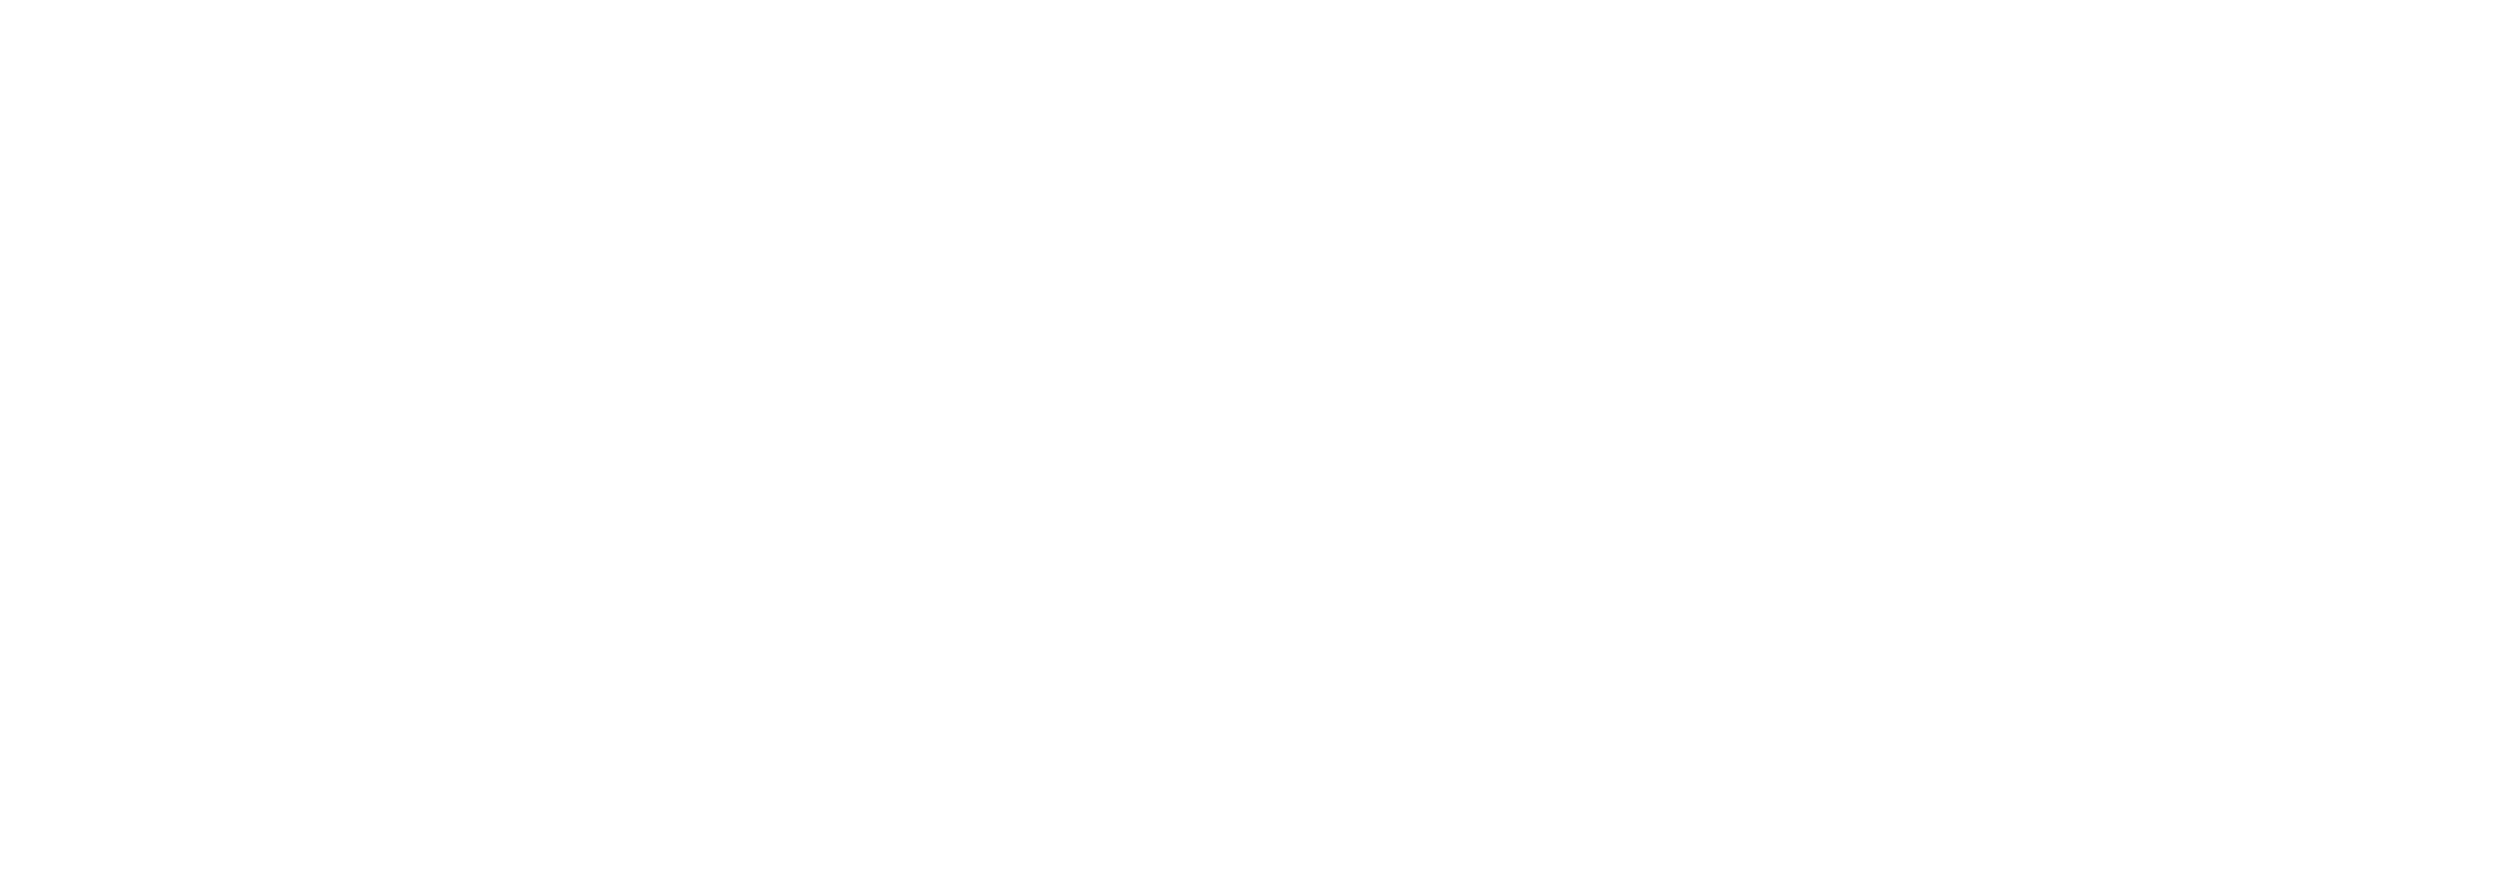 sbp logo white.png